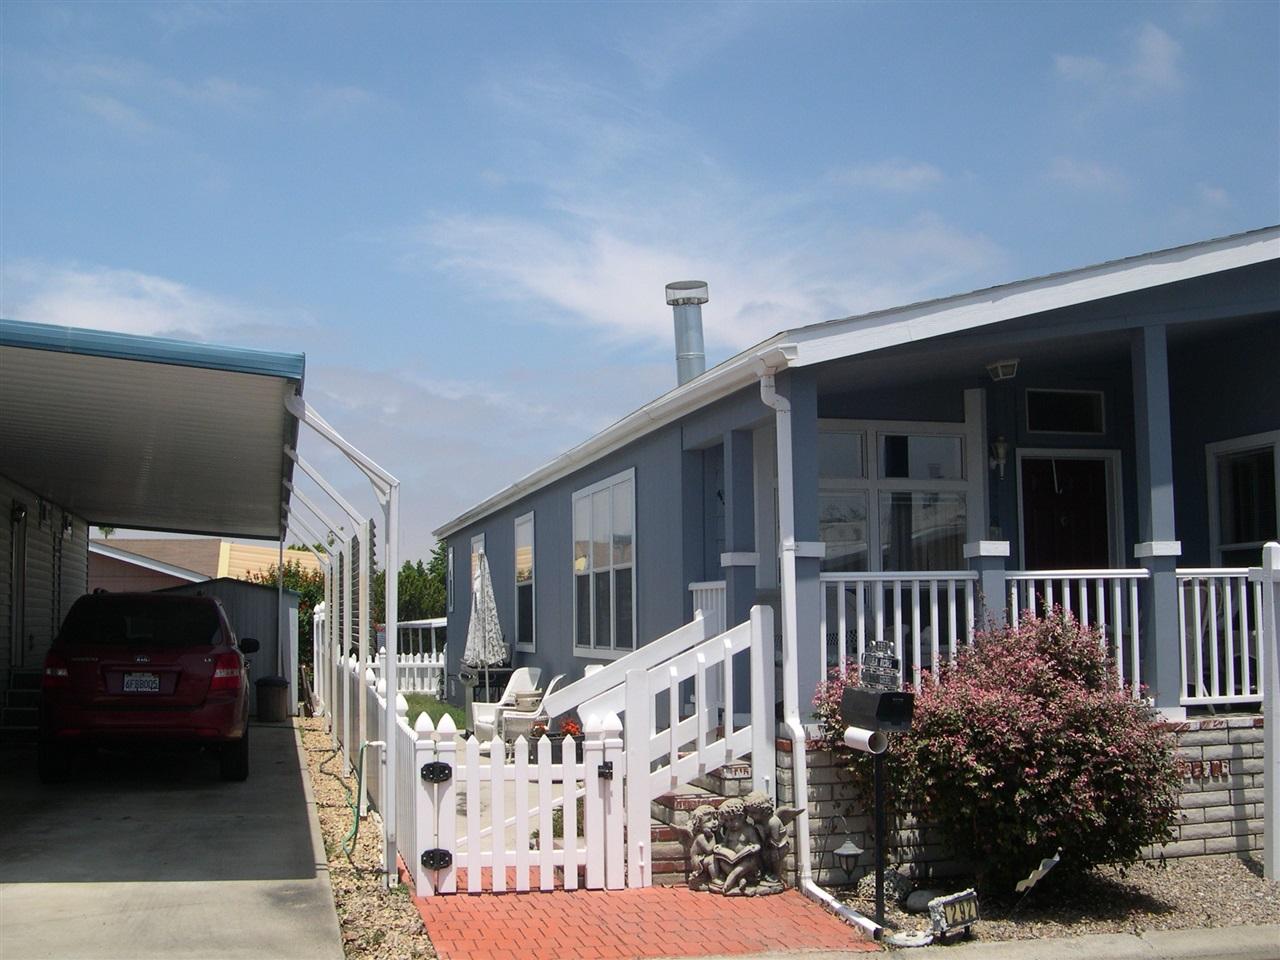 8301 Mission Gorge Rd #292, Santee, CA 92071